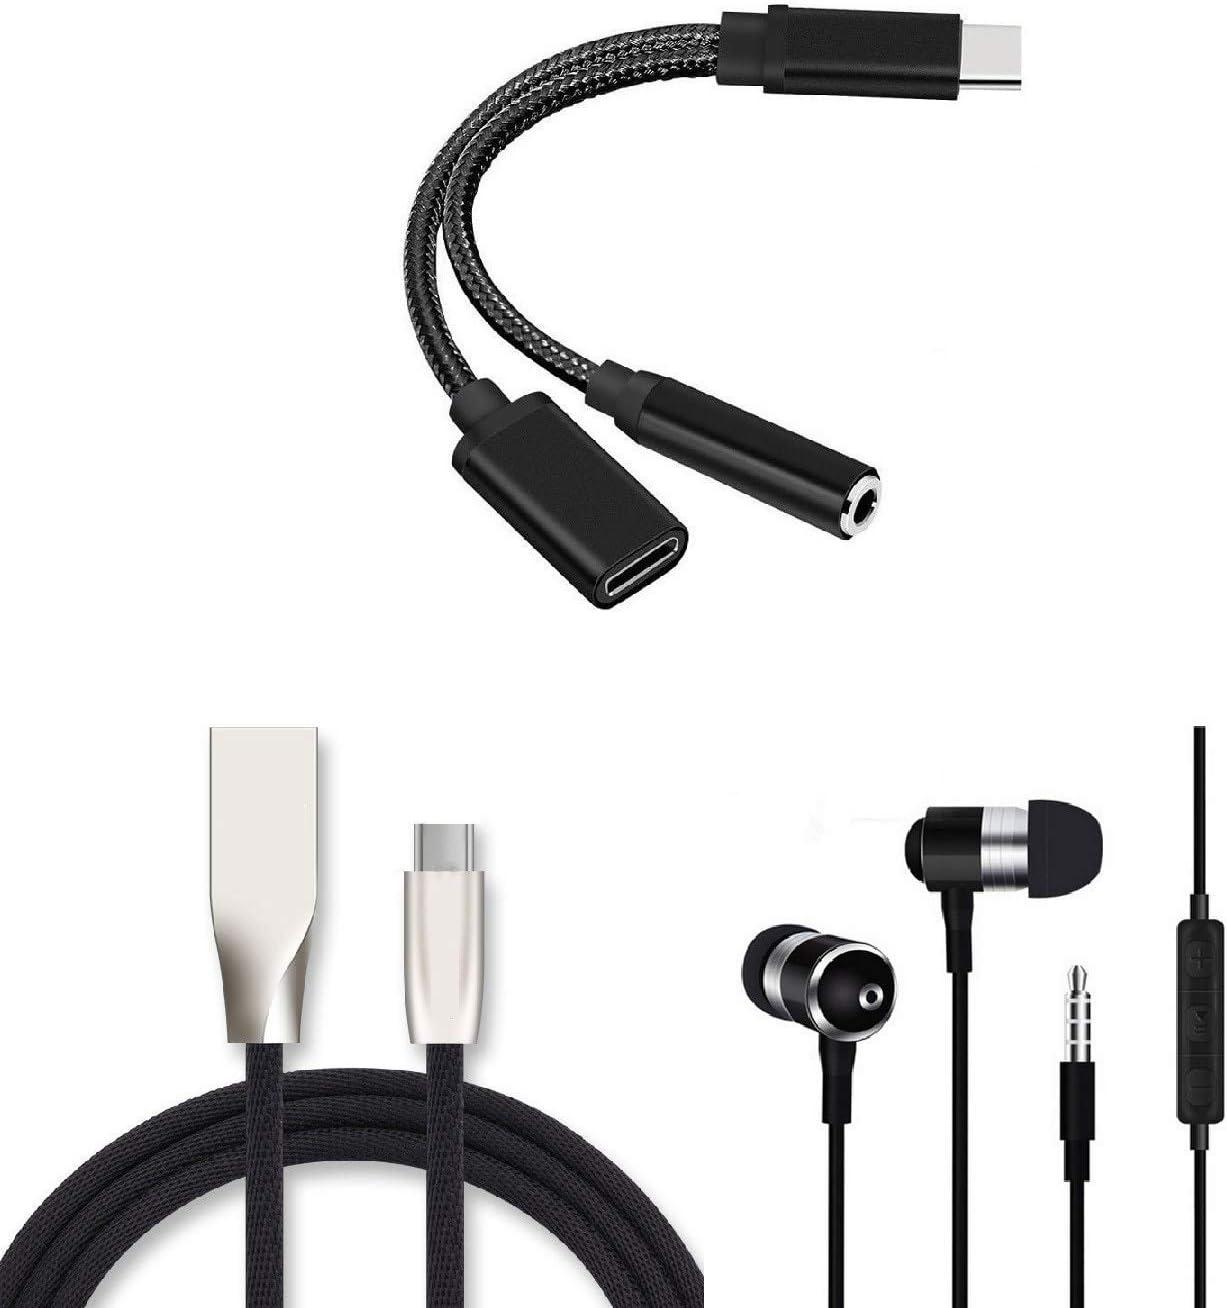 Shot Case Pack para Sony Xperia L1 (Adaptador Tipo C/Jack + Cable de Carga Tipo C + Auriculares metálicos) (Negro): Amazon.es: Electrónica